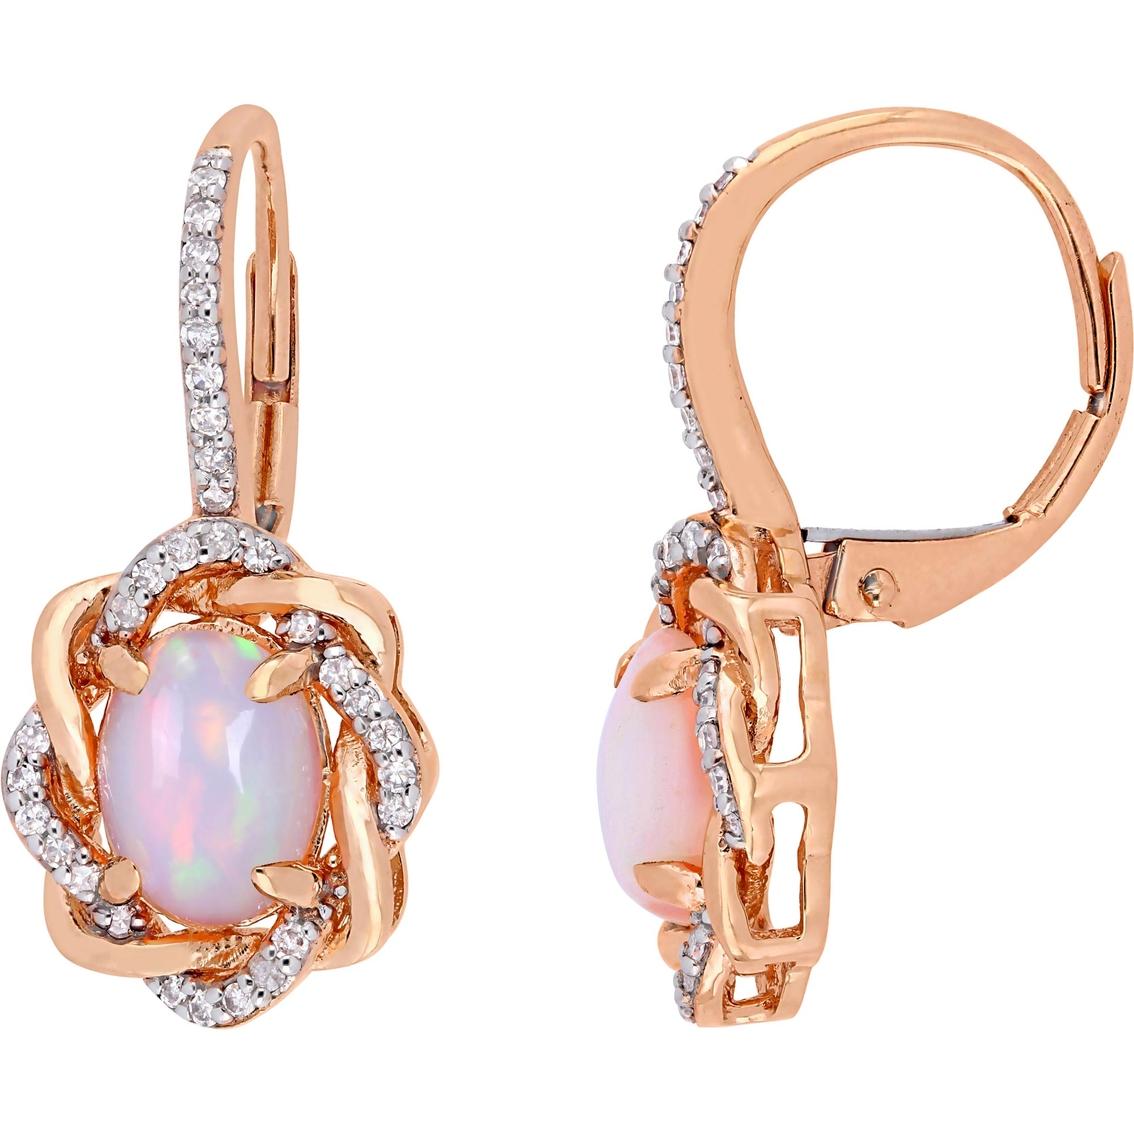 d4a96a5938861 Sofia B. 10k Rose Gold 1/4 Ctw Diamond And Ethiopian Opal Earrings ...